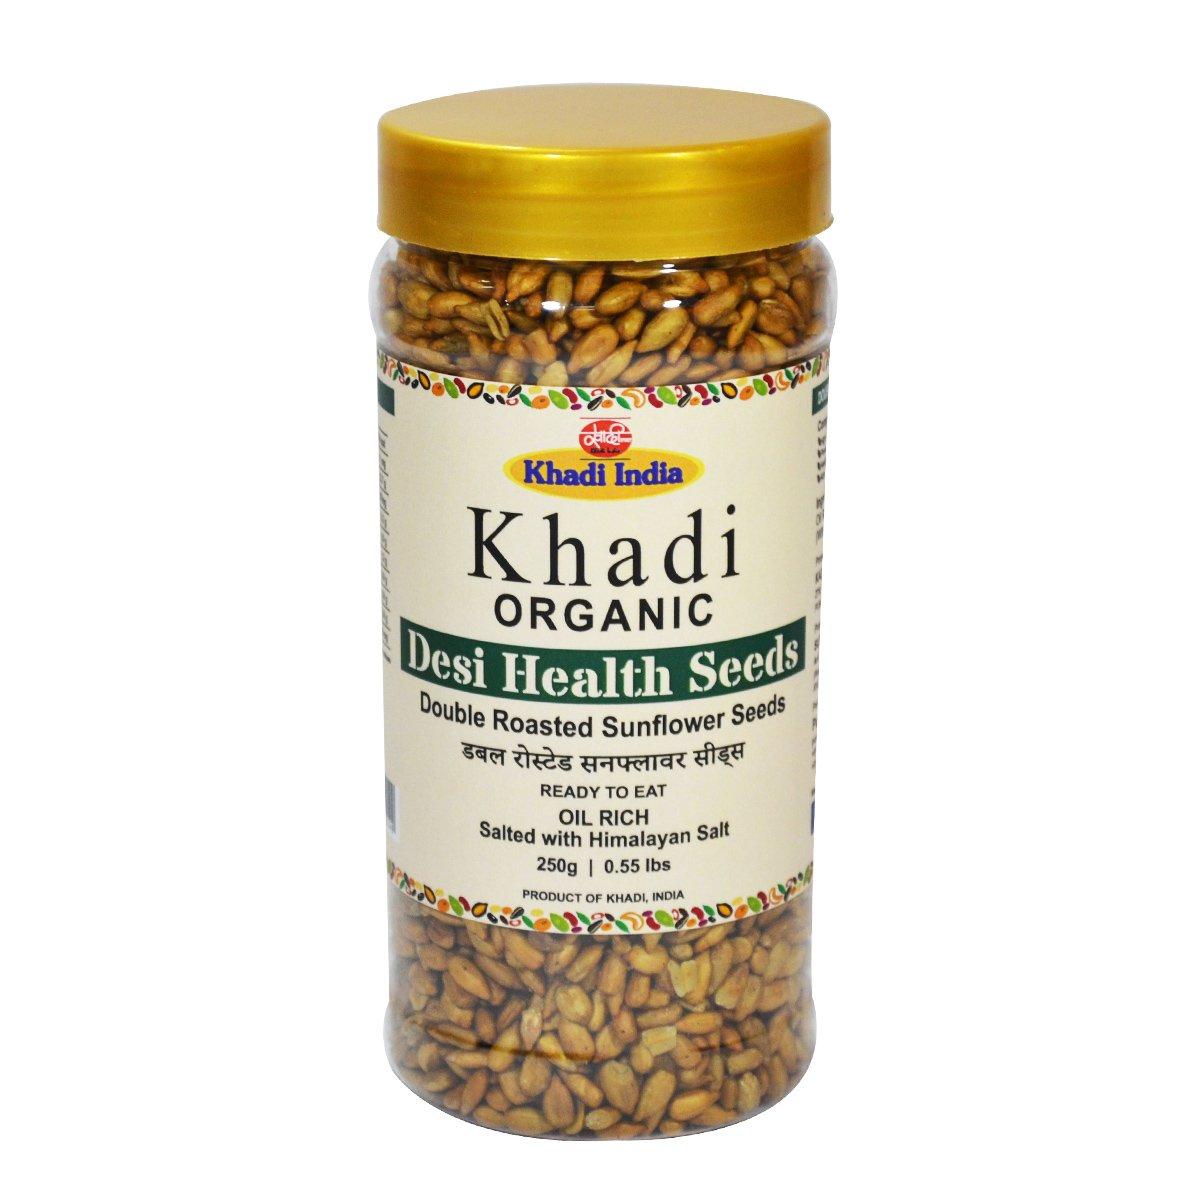 Khadi Organic Roasted Salted Sun Flower Seeds 250 GM - 100% Natural, Gluten-Free, High-Fibre, Healthy Organic Food Rich in Proteins, Vitamins, Minerals